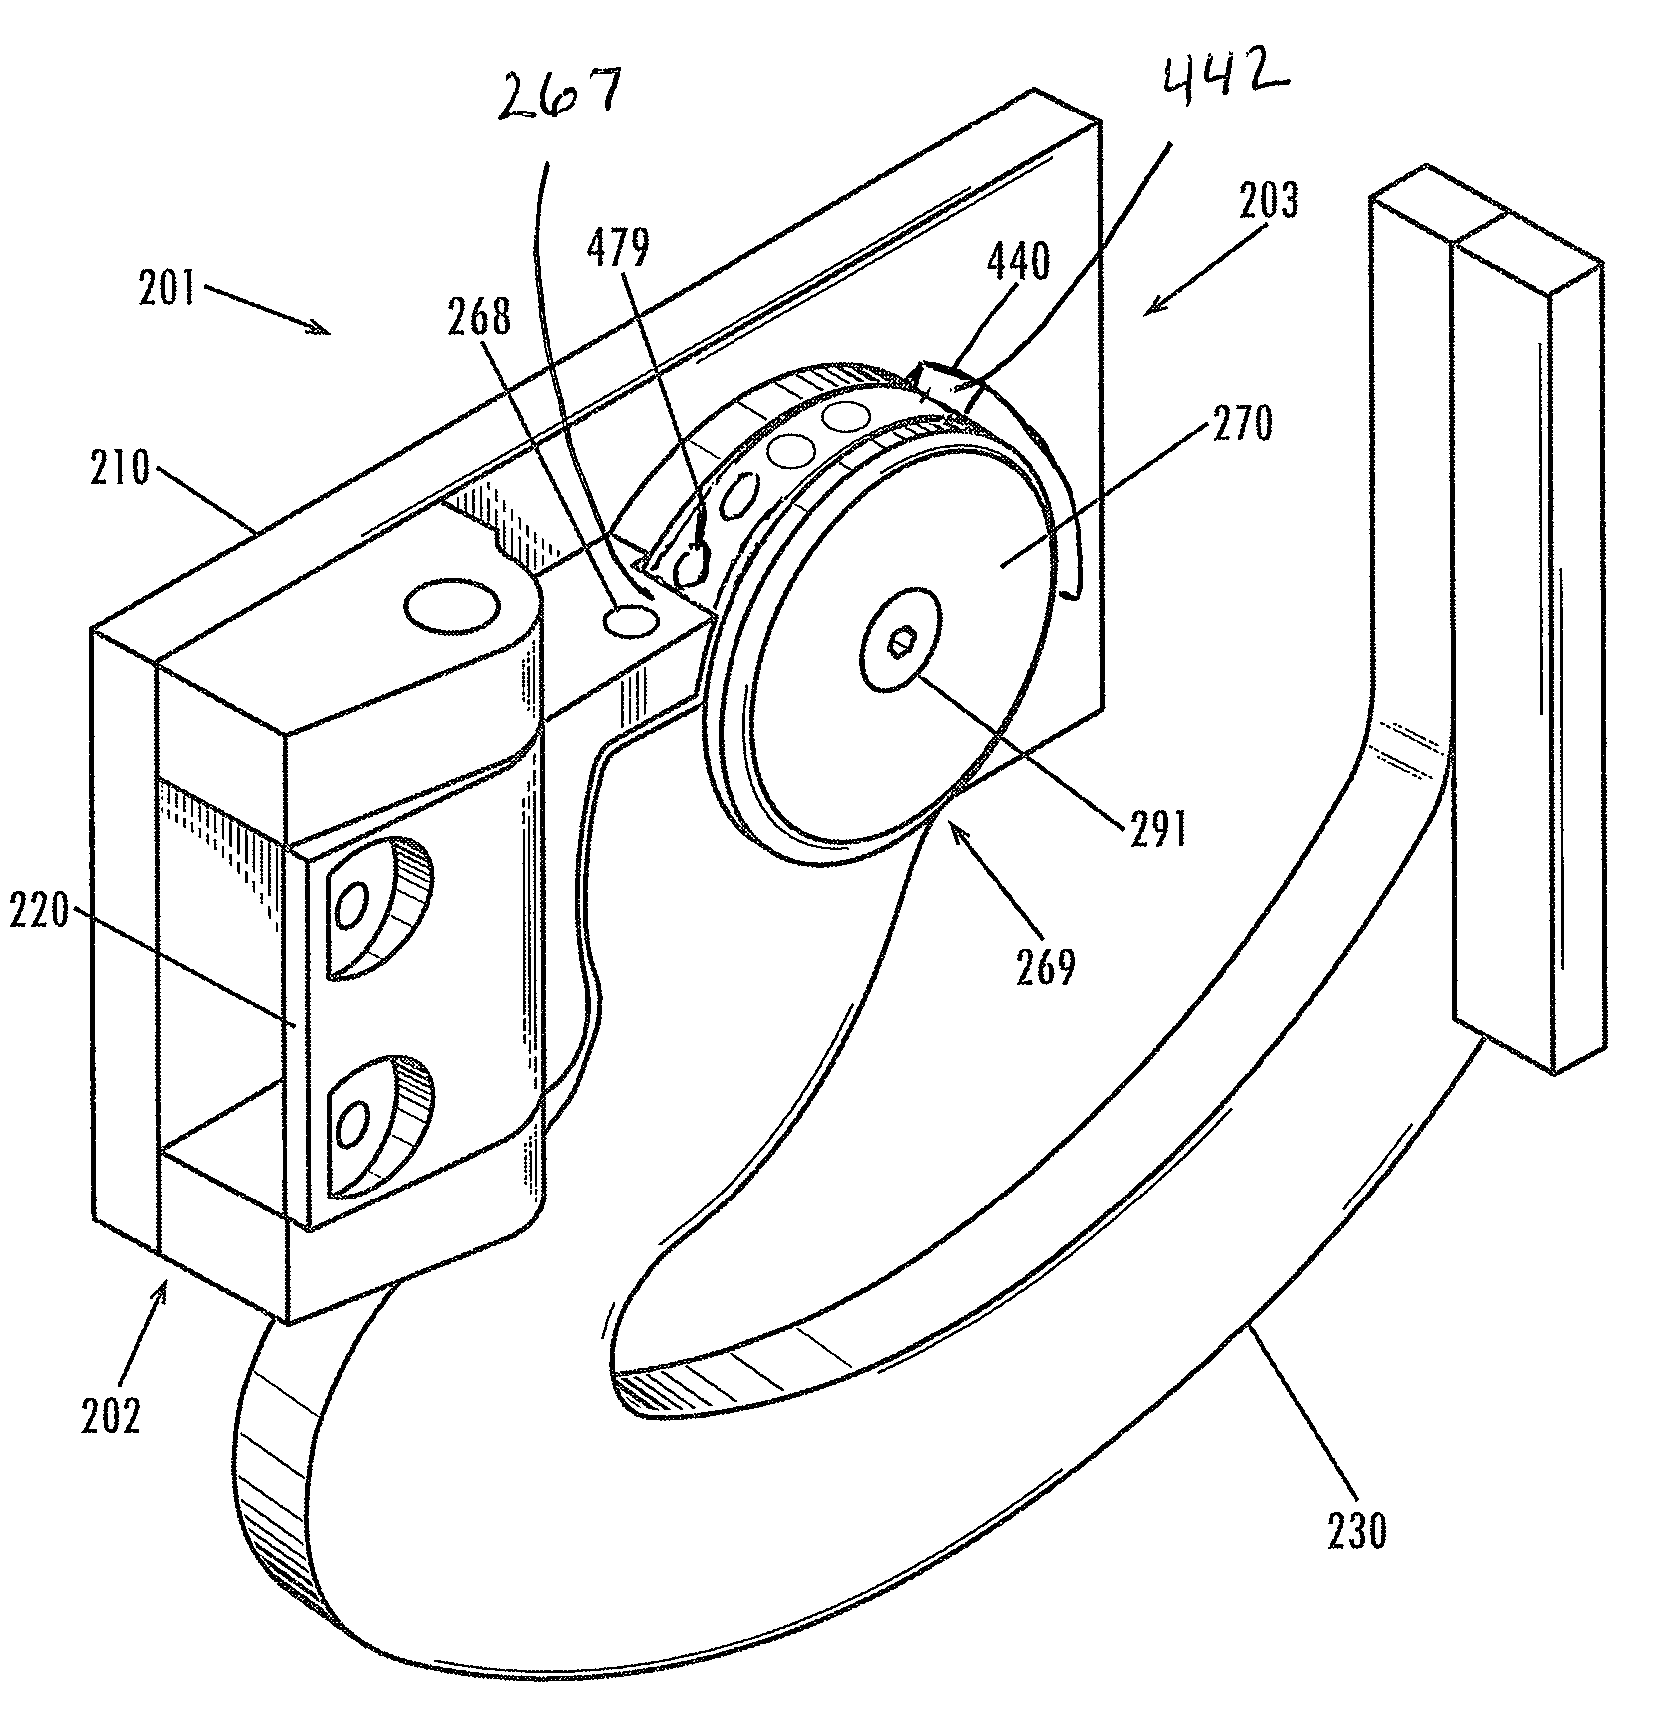 patent us7779510 - multi-axis door hinge